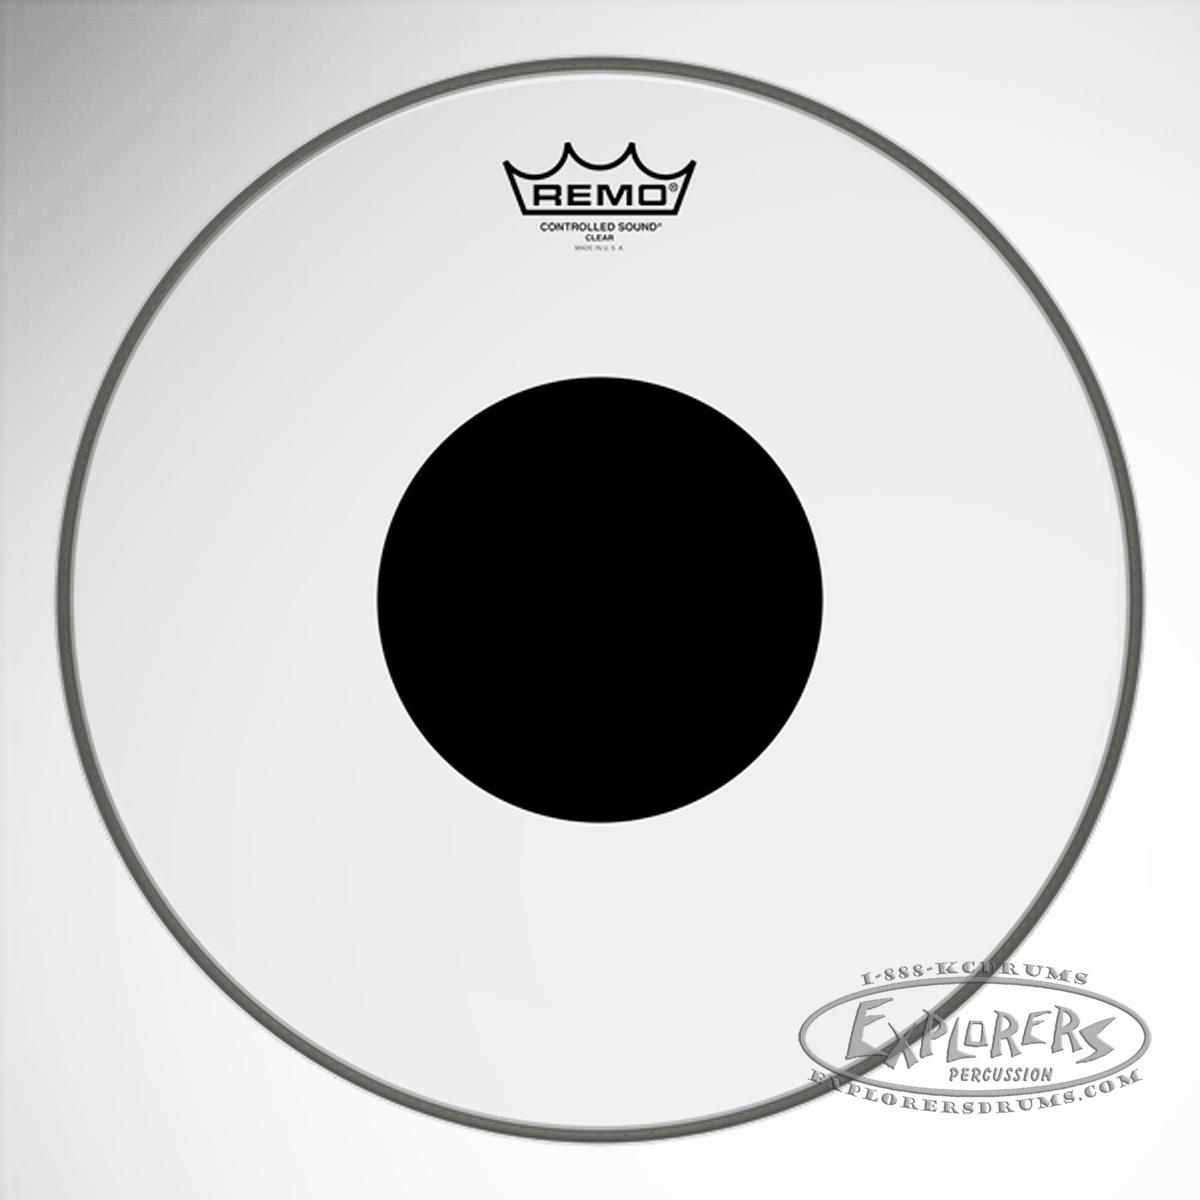 remo controlled sound clear tom snare batter drum head w top black dot. Black Bedroom Furniture Sets. Home Design Ideas